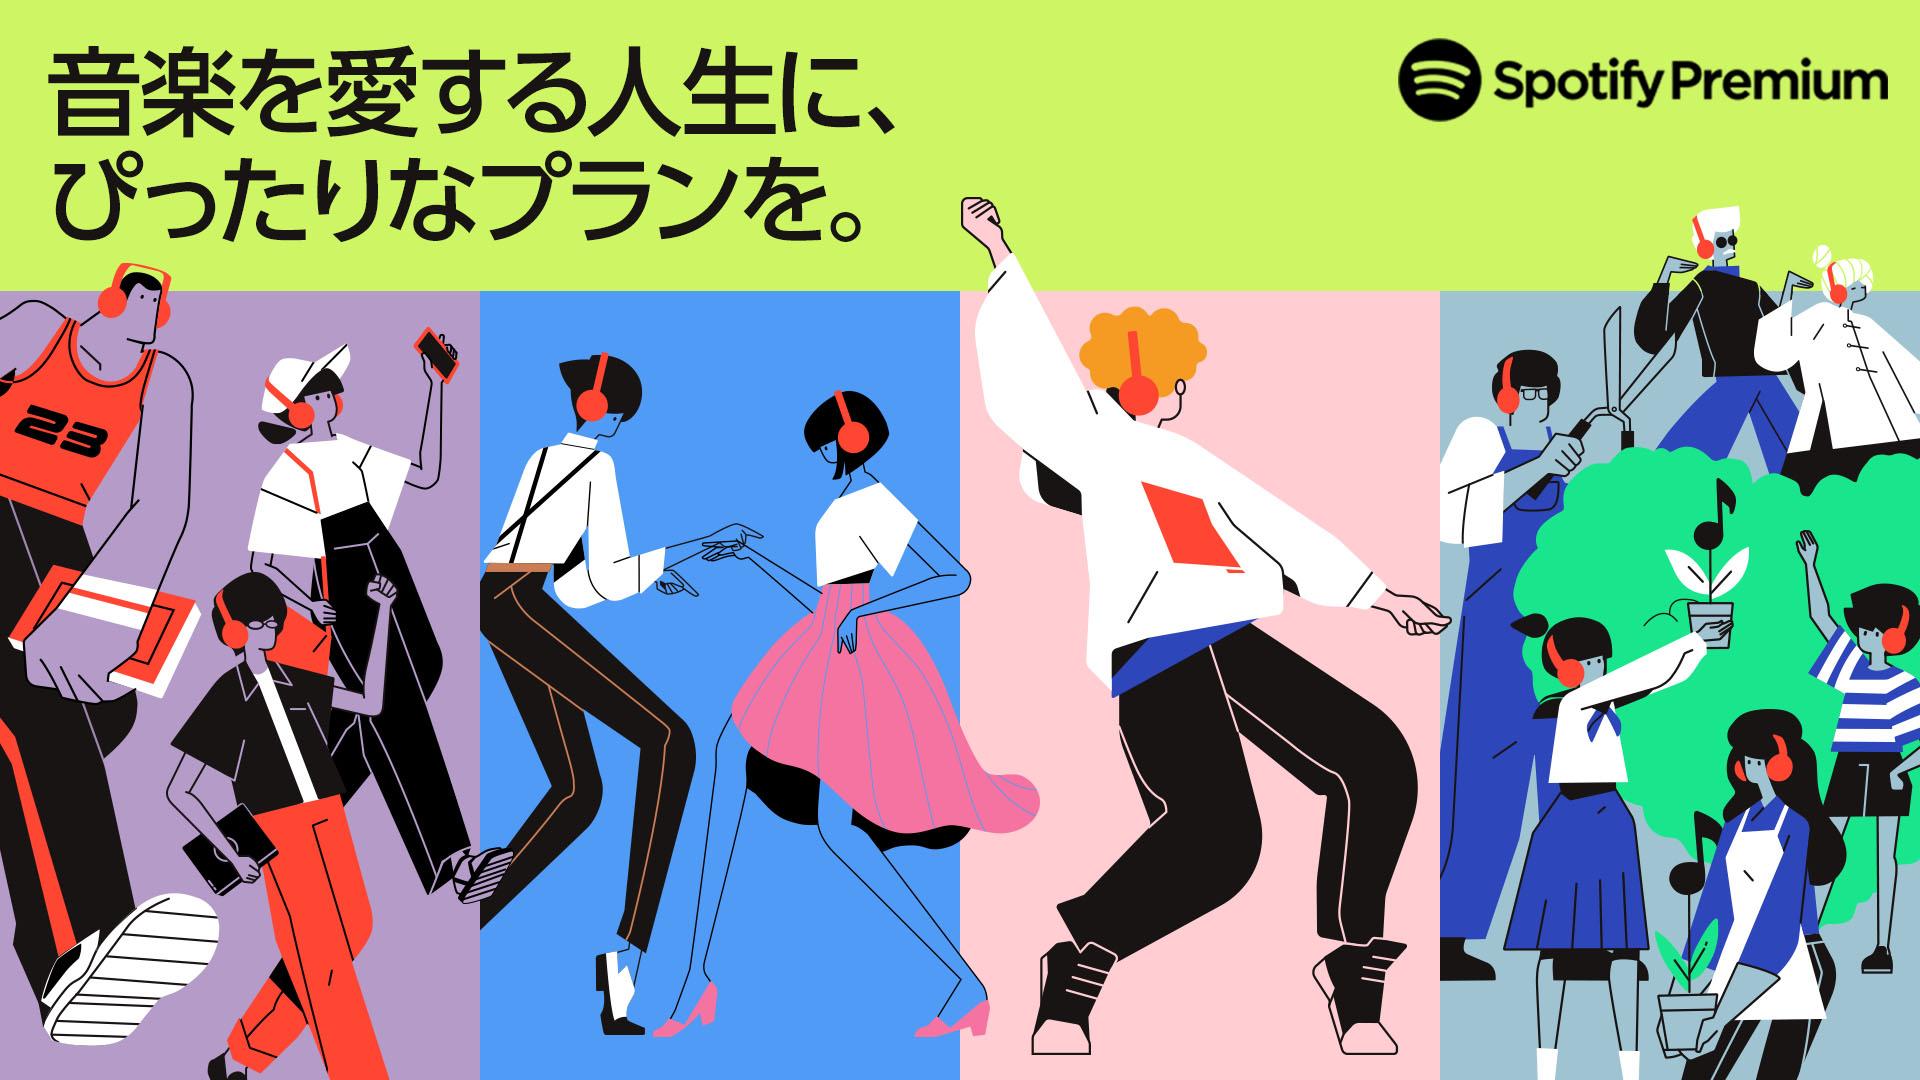 Spotifyが音楽ファンの様々なライフスタイルにマッチする各種プランを紹介するテレビCMを放映